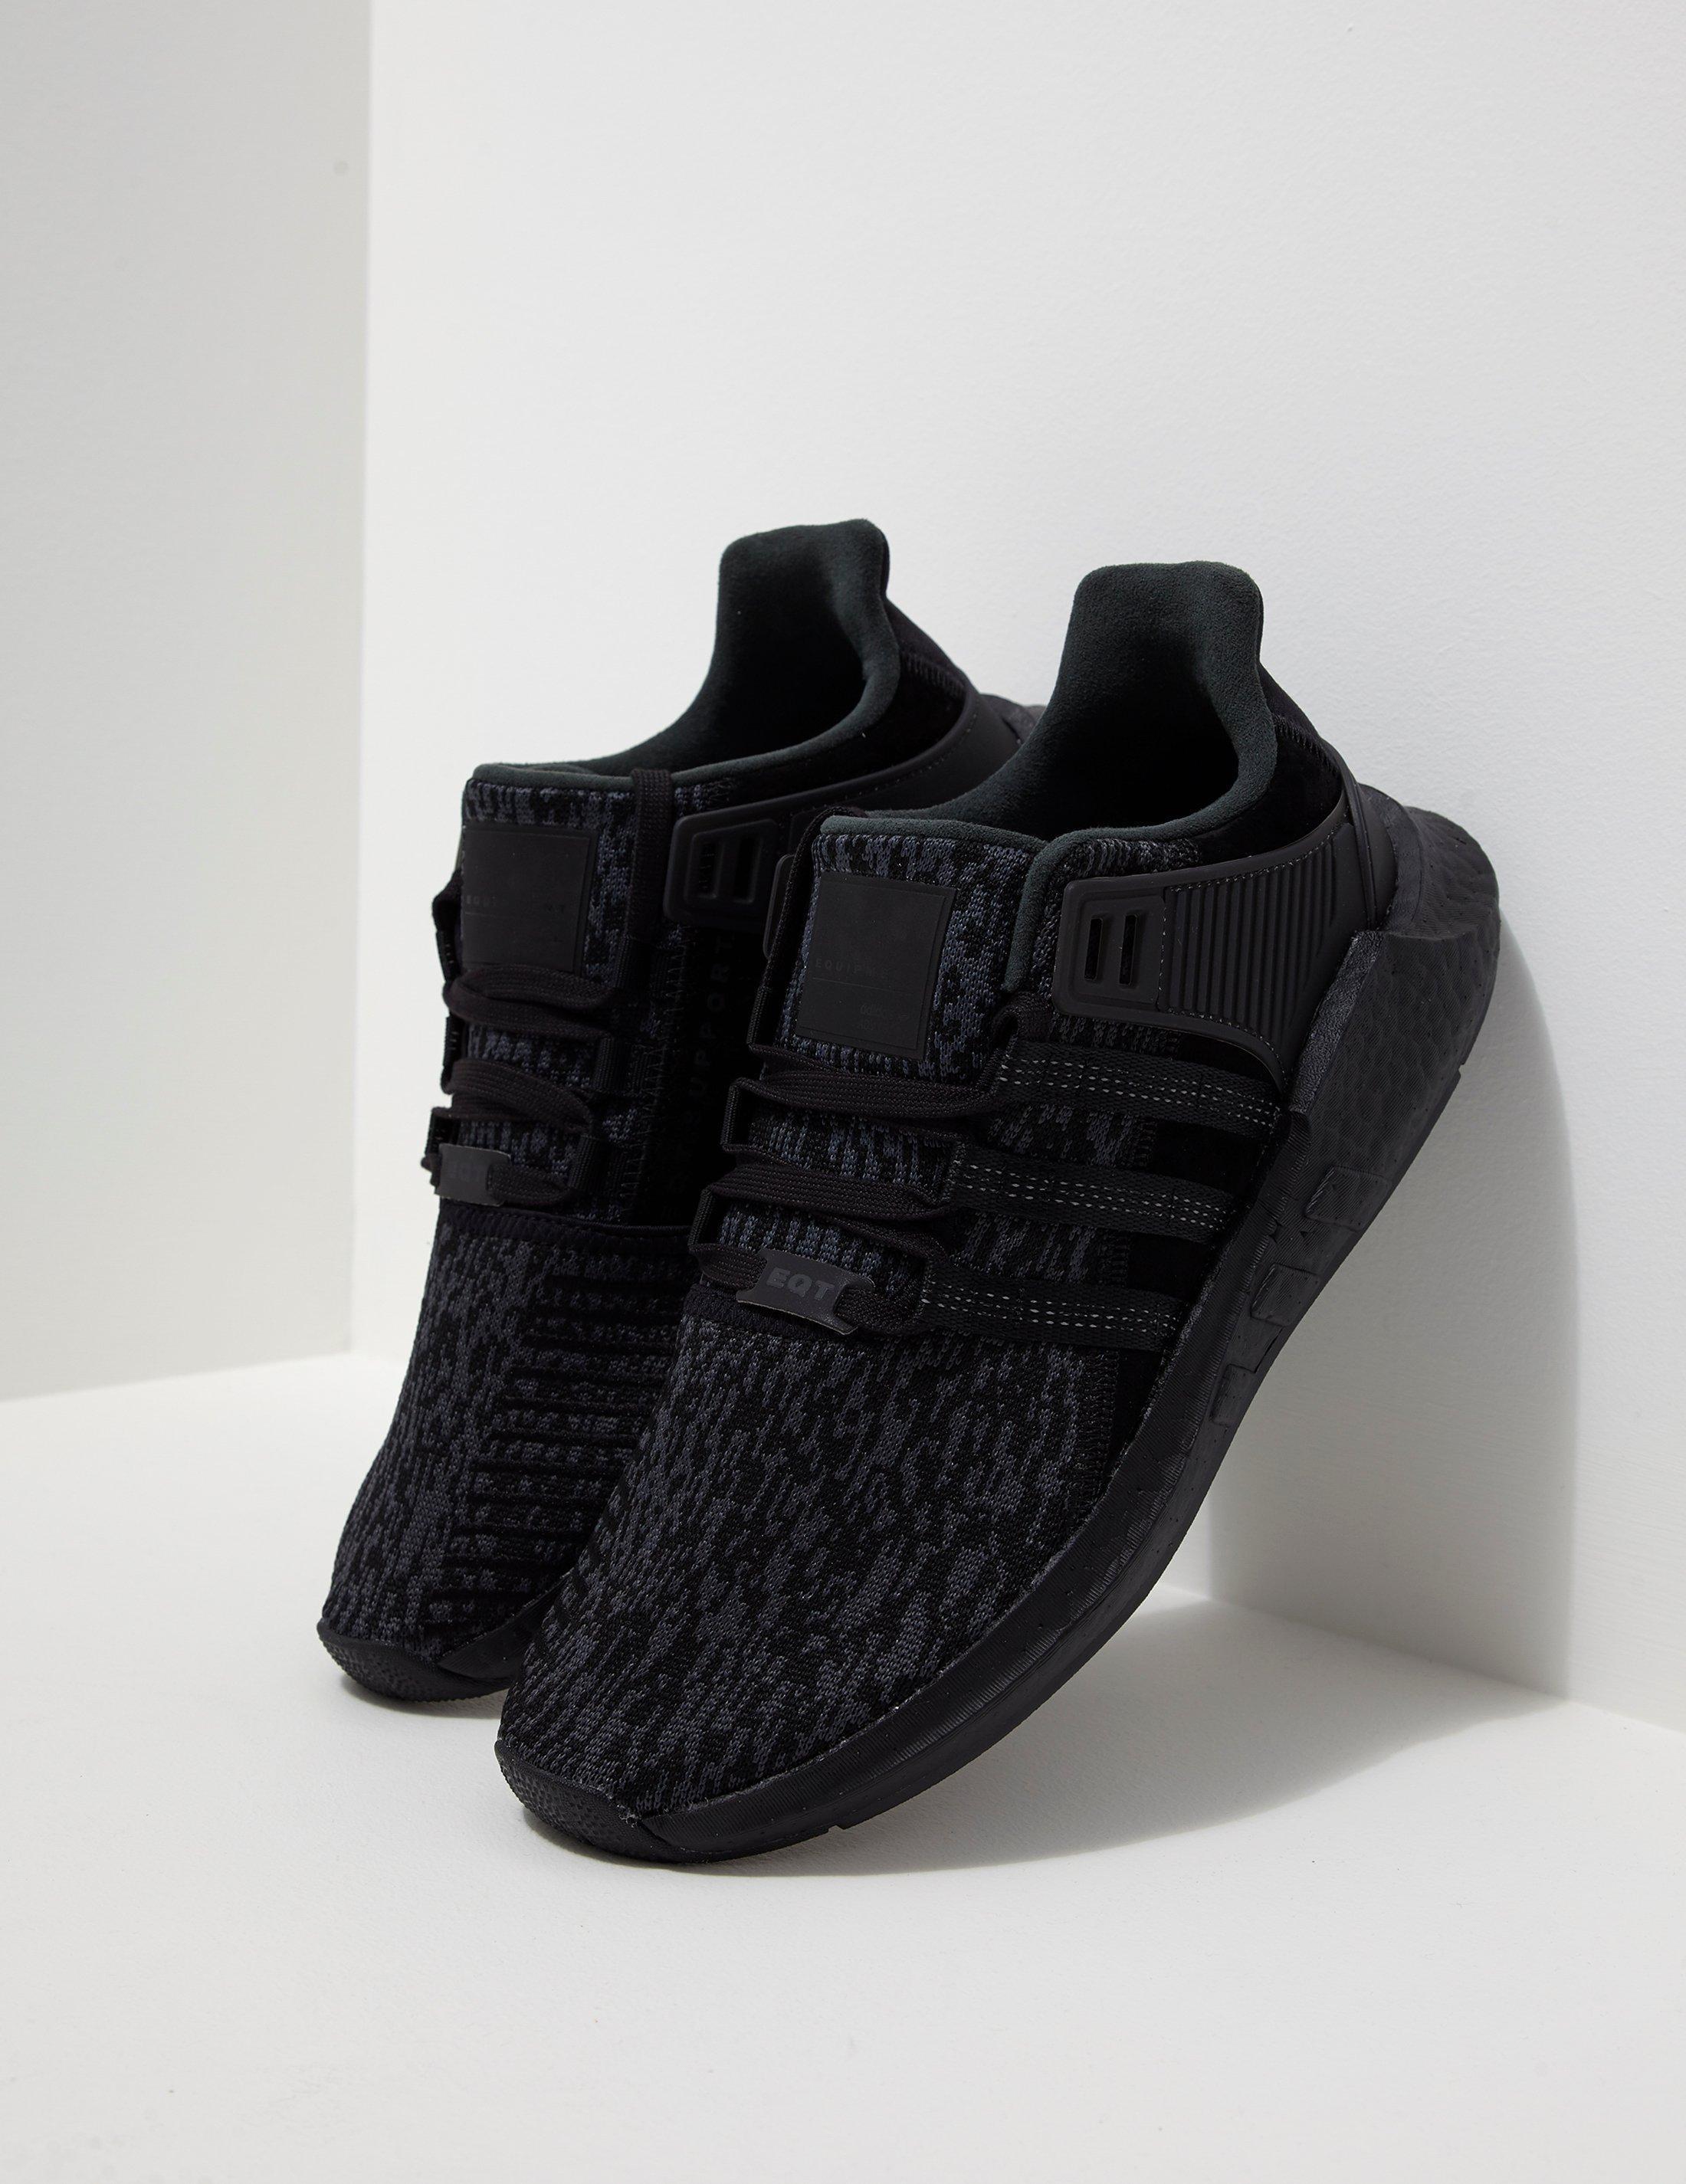 ade068f48c9e6c Lyst - Adidas Originals Mens Eqt Support 93 17 Black in Black for Men